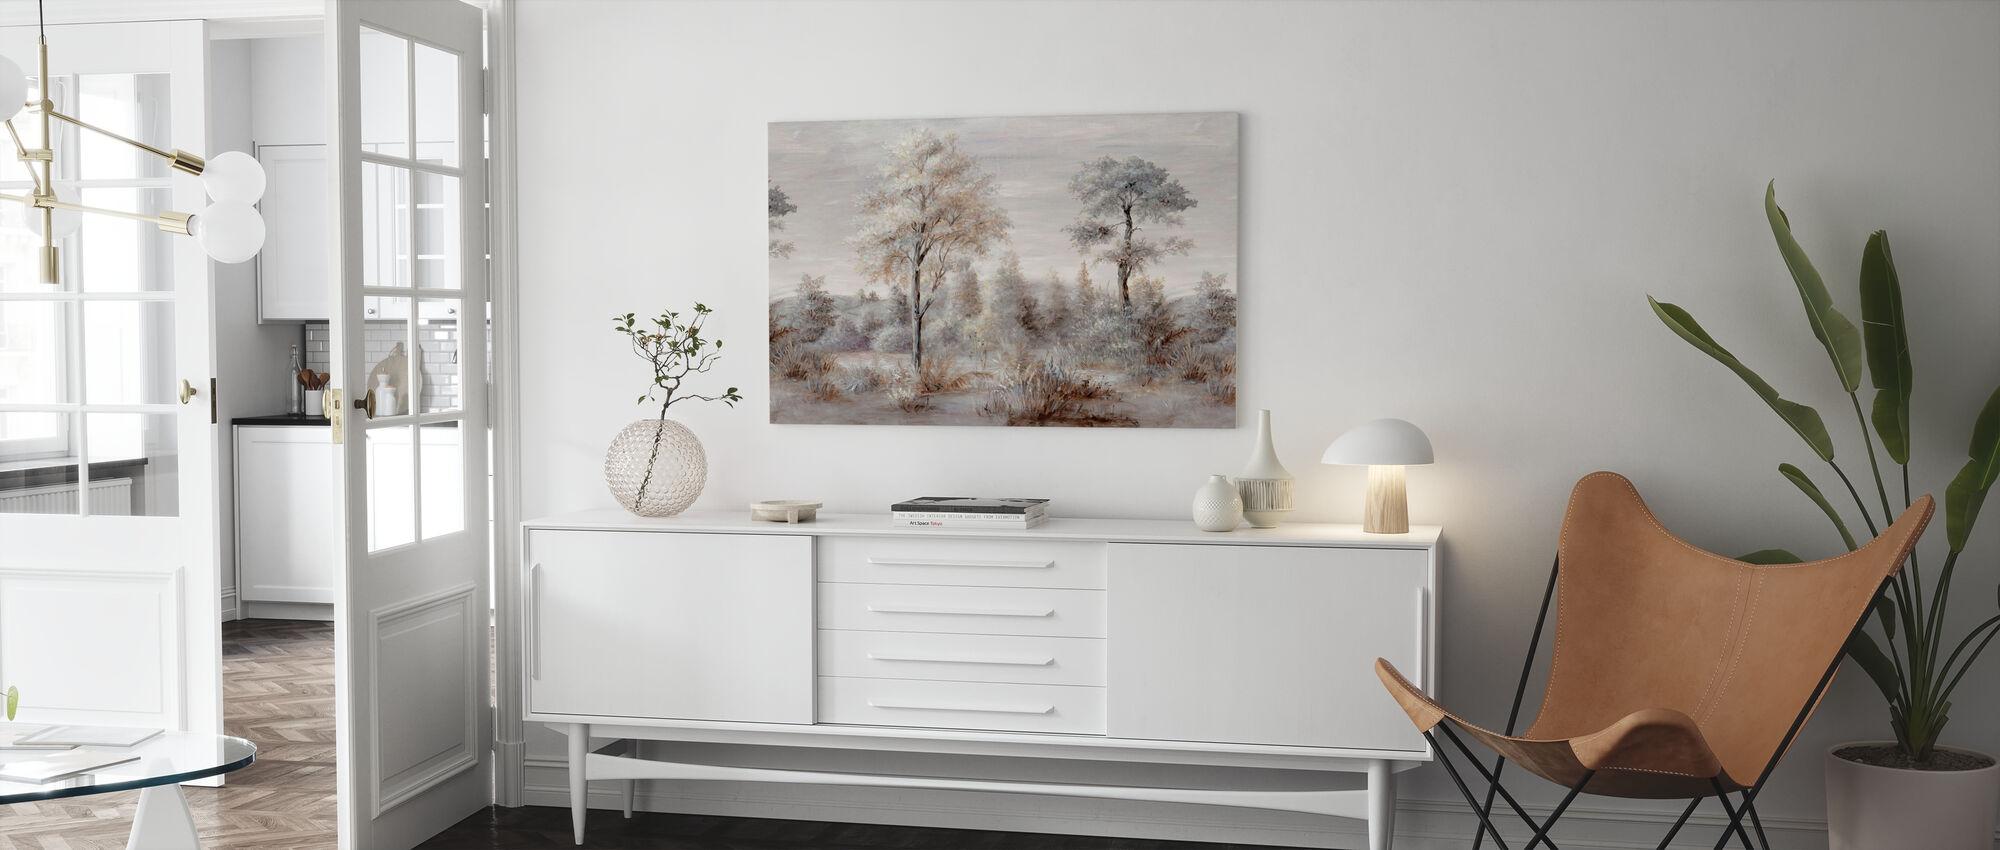 Expressive View - Canvas print - Living Room